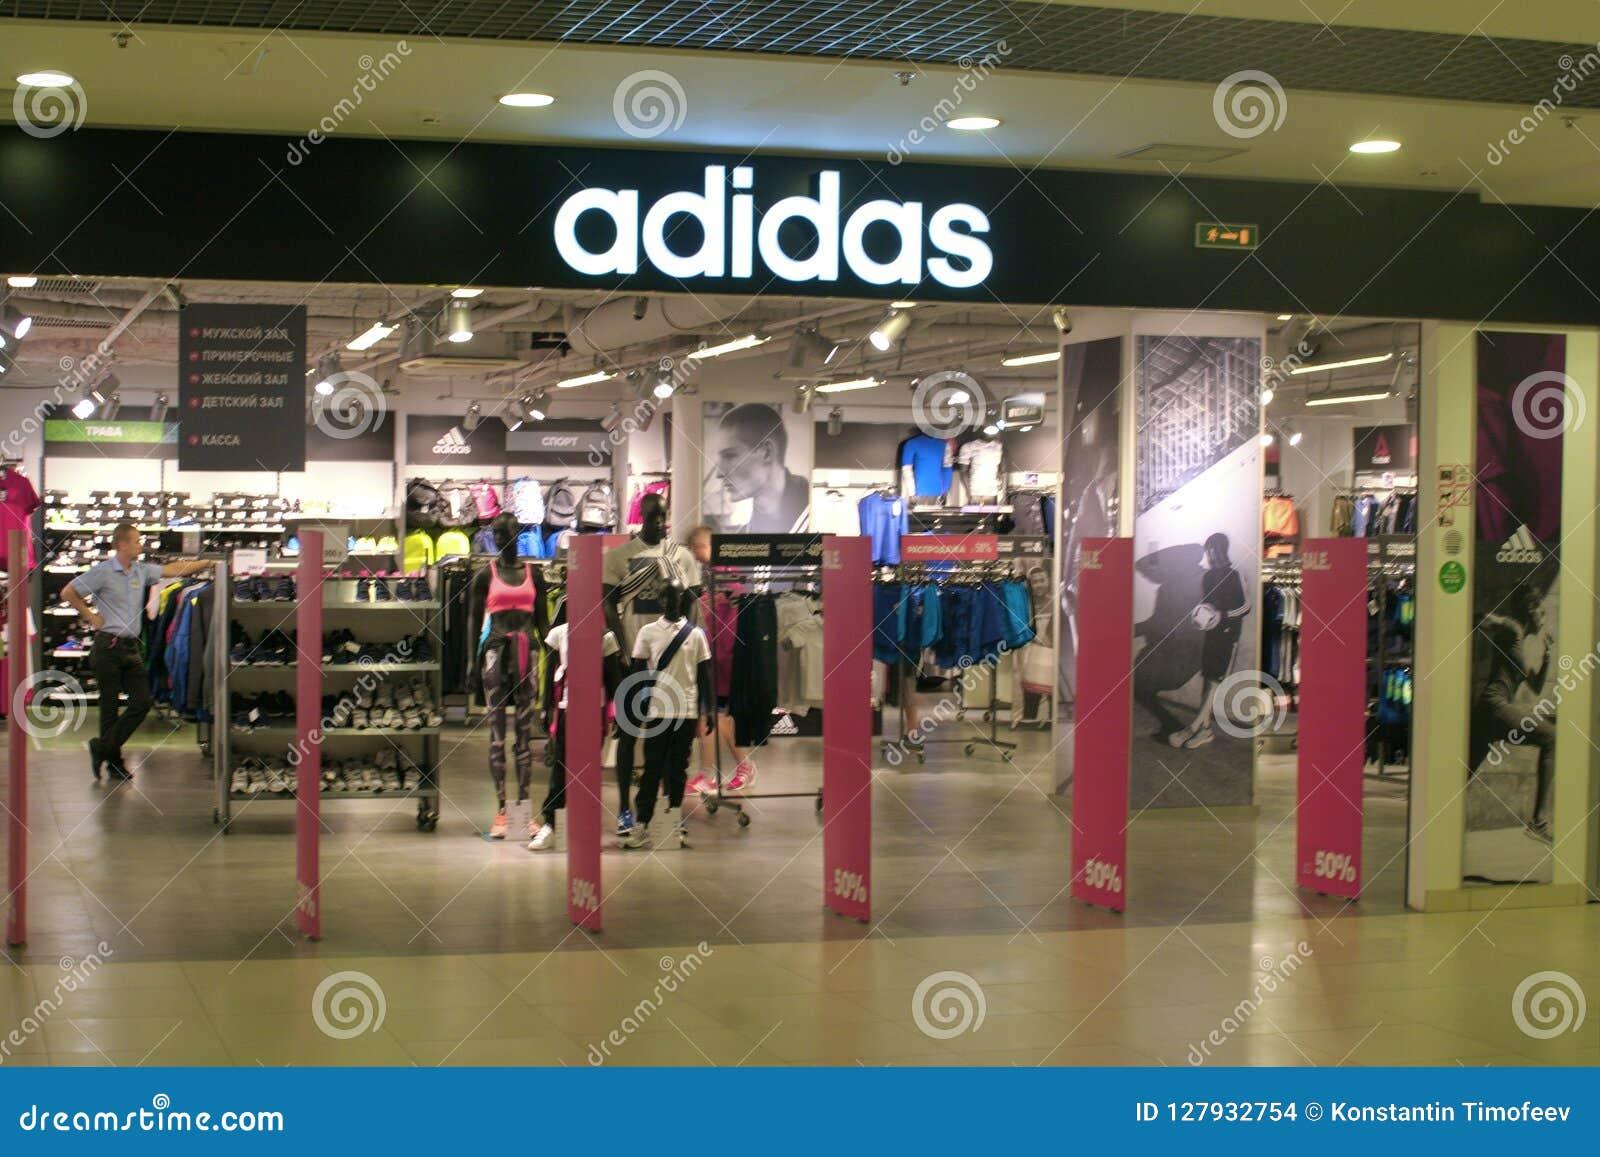 cobre motor Empotrar  Saint Petersburg, Russia - August 08, 2018: Shop Adidas In The Mall.  Company Logo. Editorial Stock Image - Image of logotype, international:  127932754